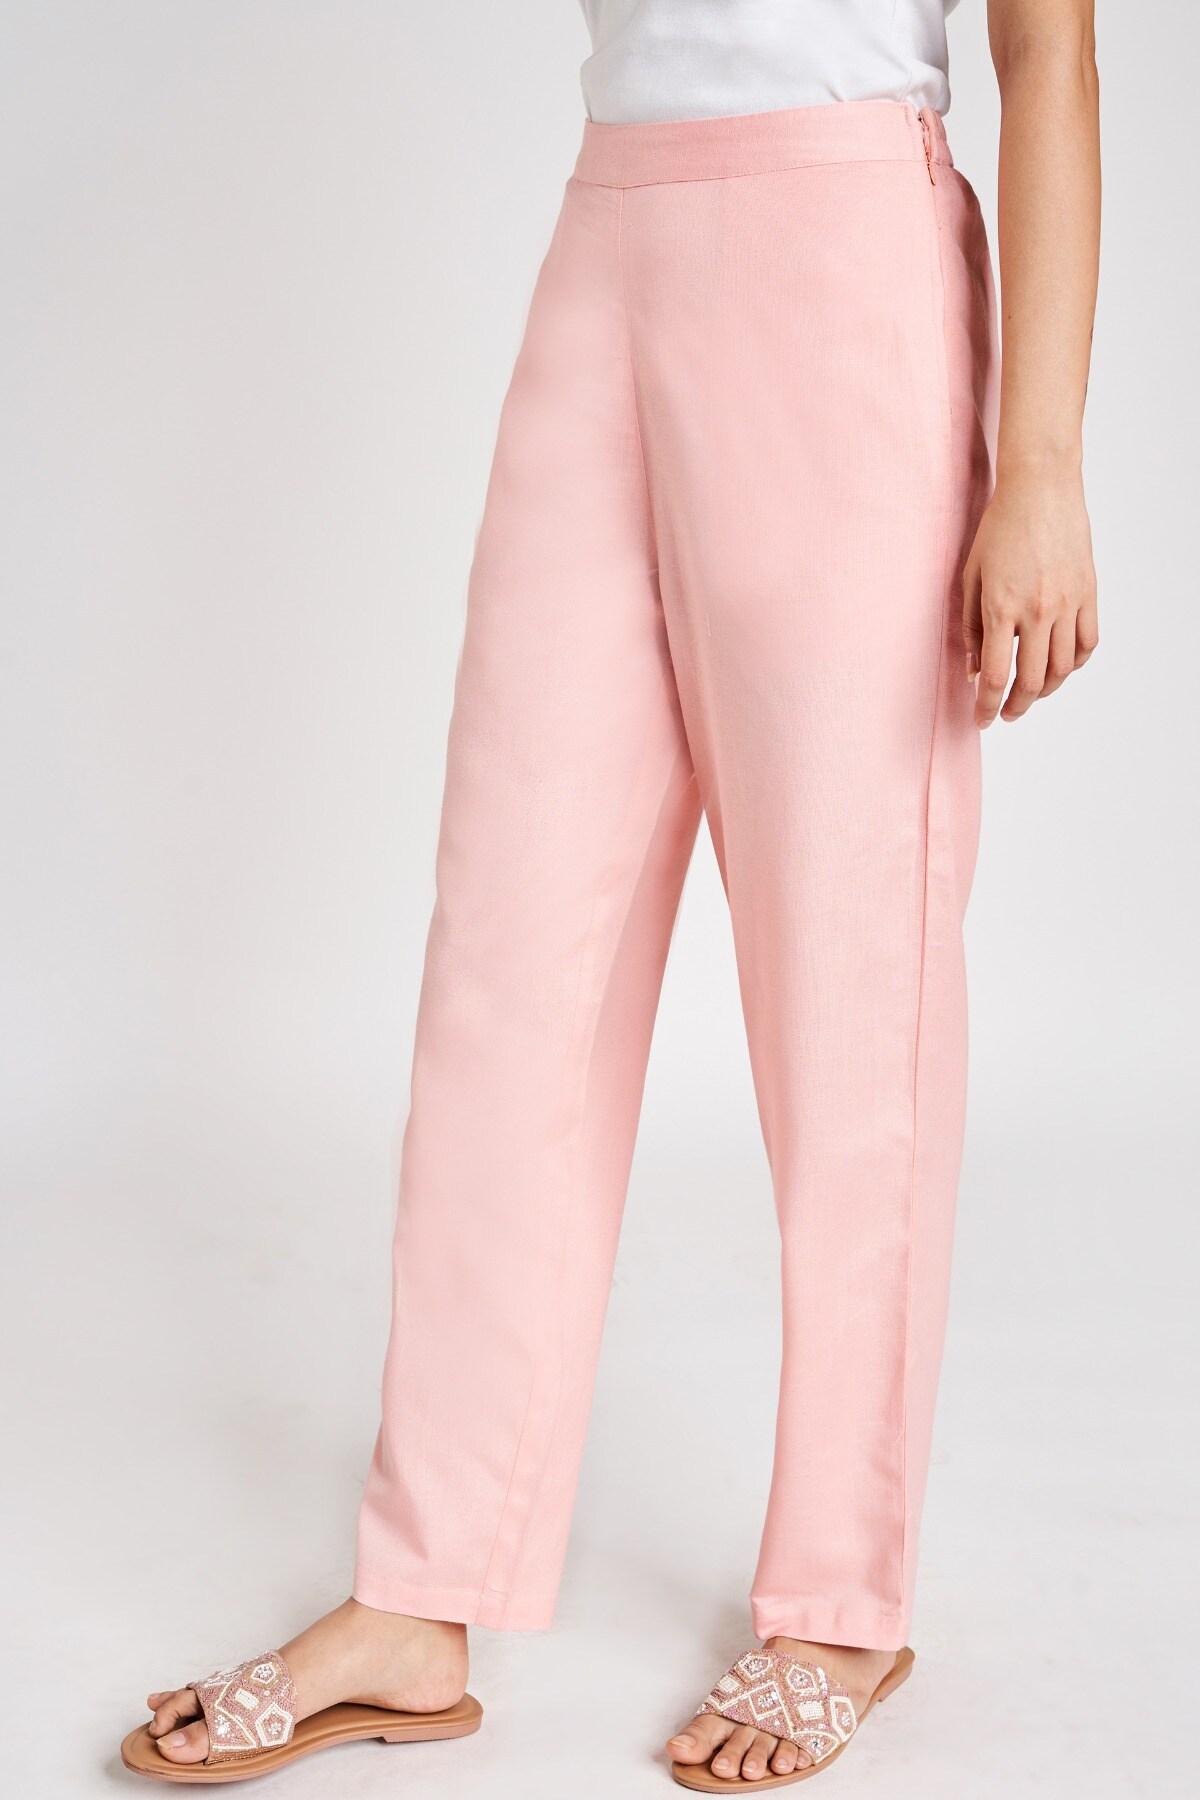 Global Desi   Pink Solid Bottom